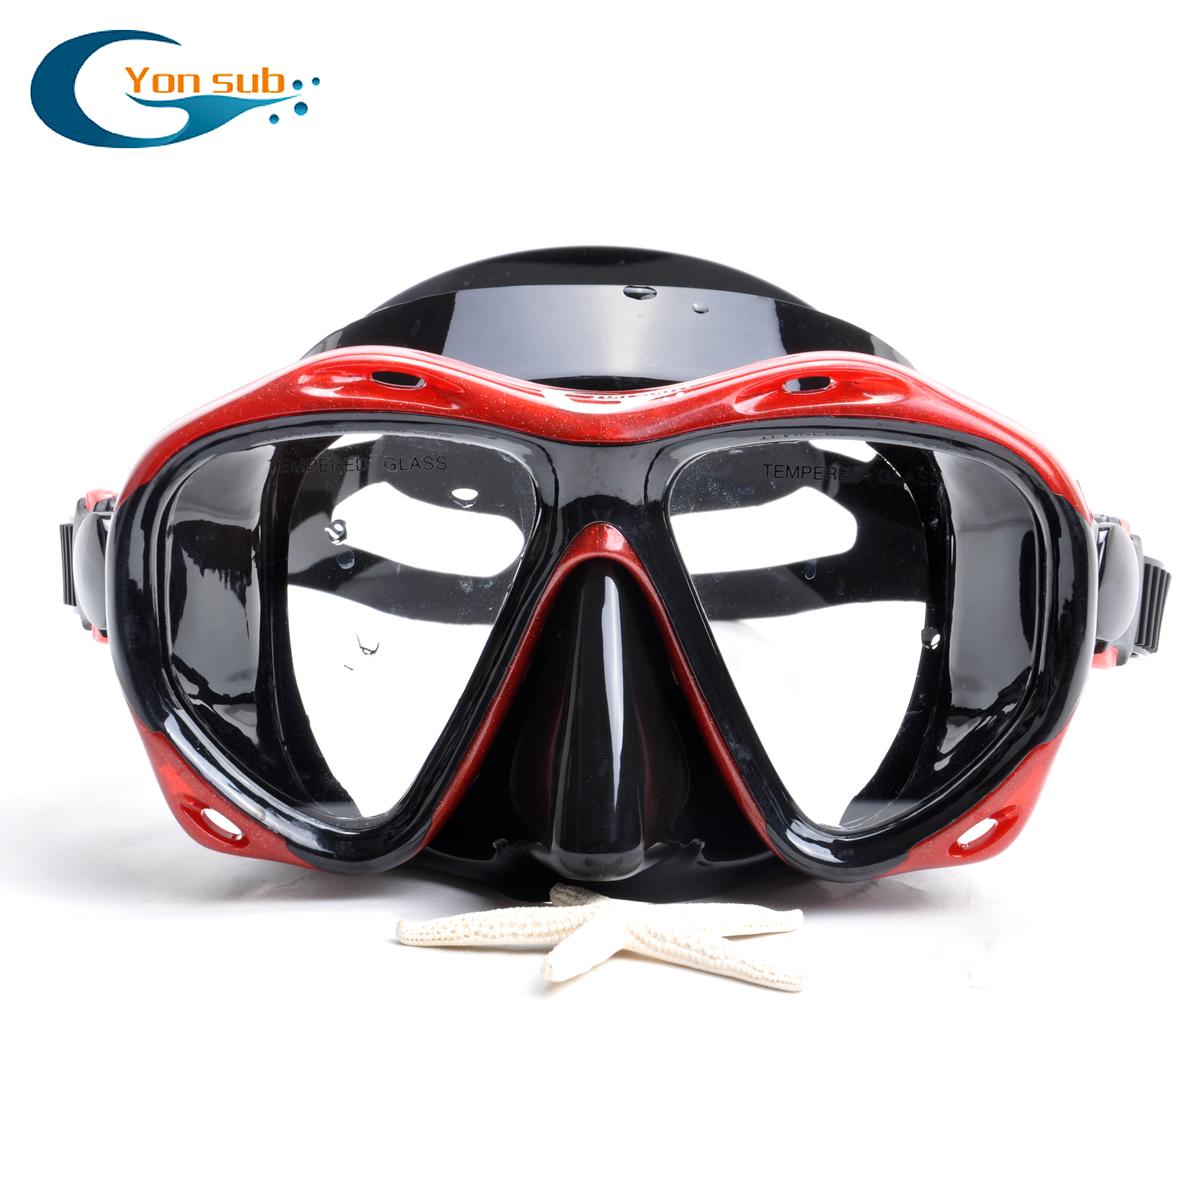 YonSub professional diving glasses Diving Snorkeling Sambo myopia / smooth surface mirror dry equipment package(China (Mainland))